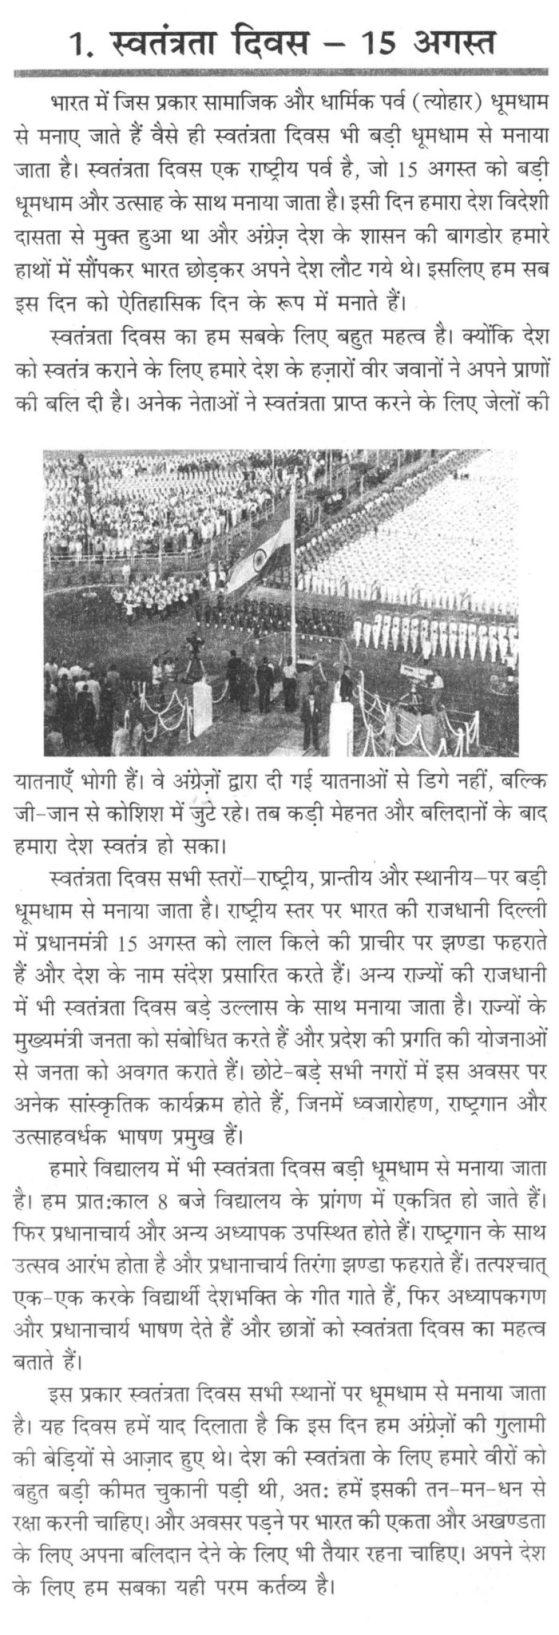 swatantrata diwas par bhashan